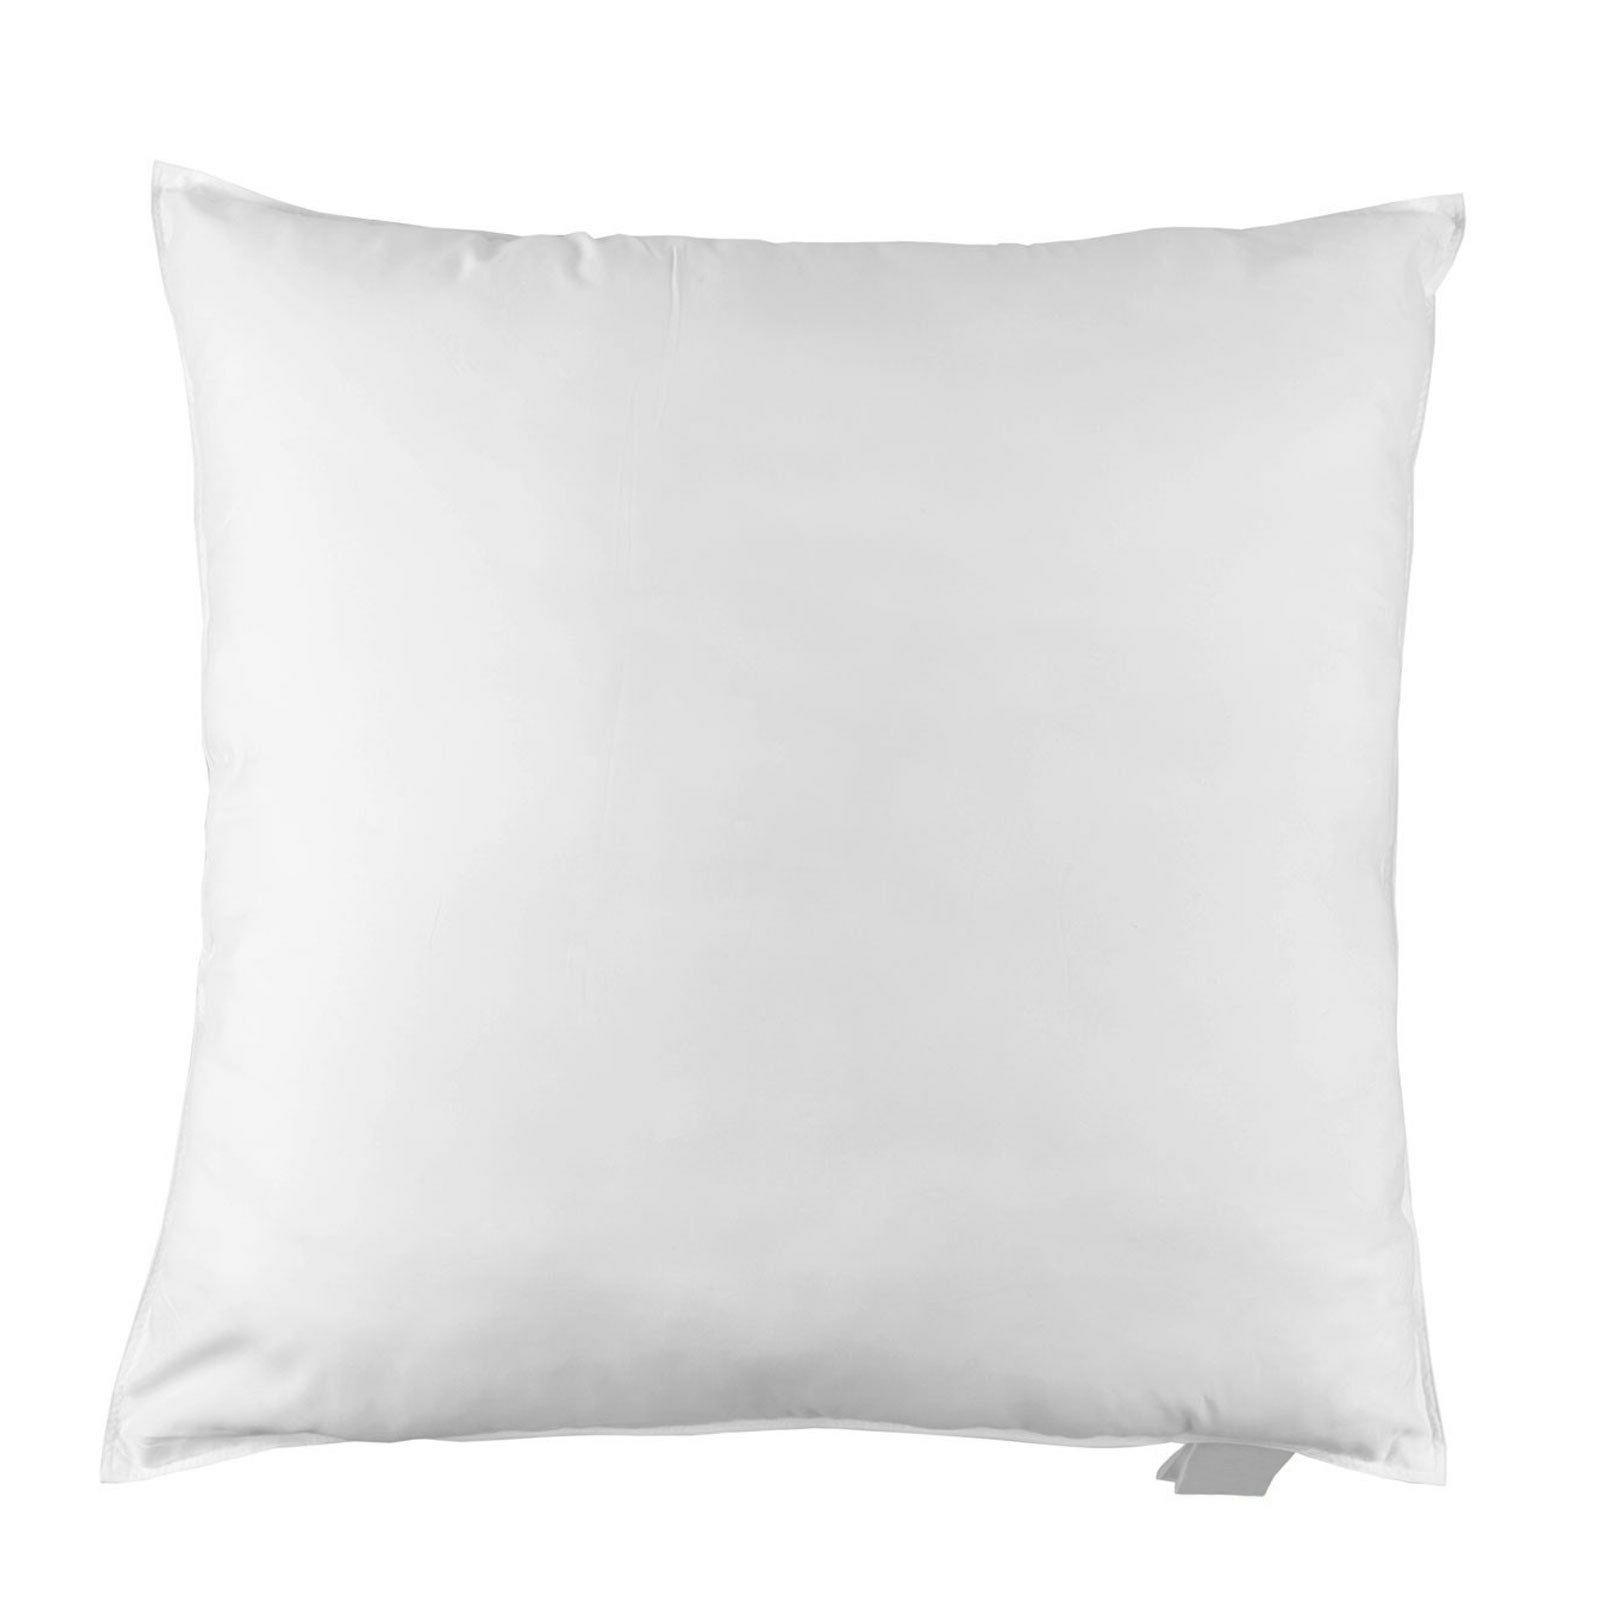 "2 x Square Pillow 65cm 26"" x 26"" Hotel Quality"